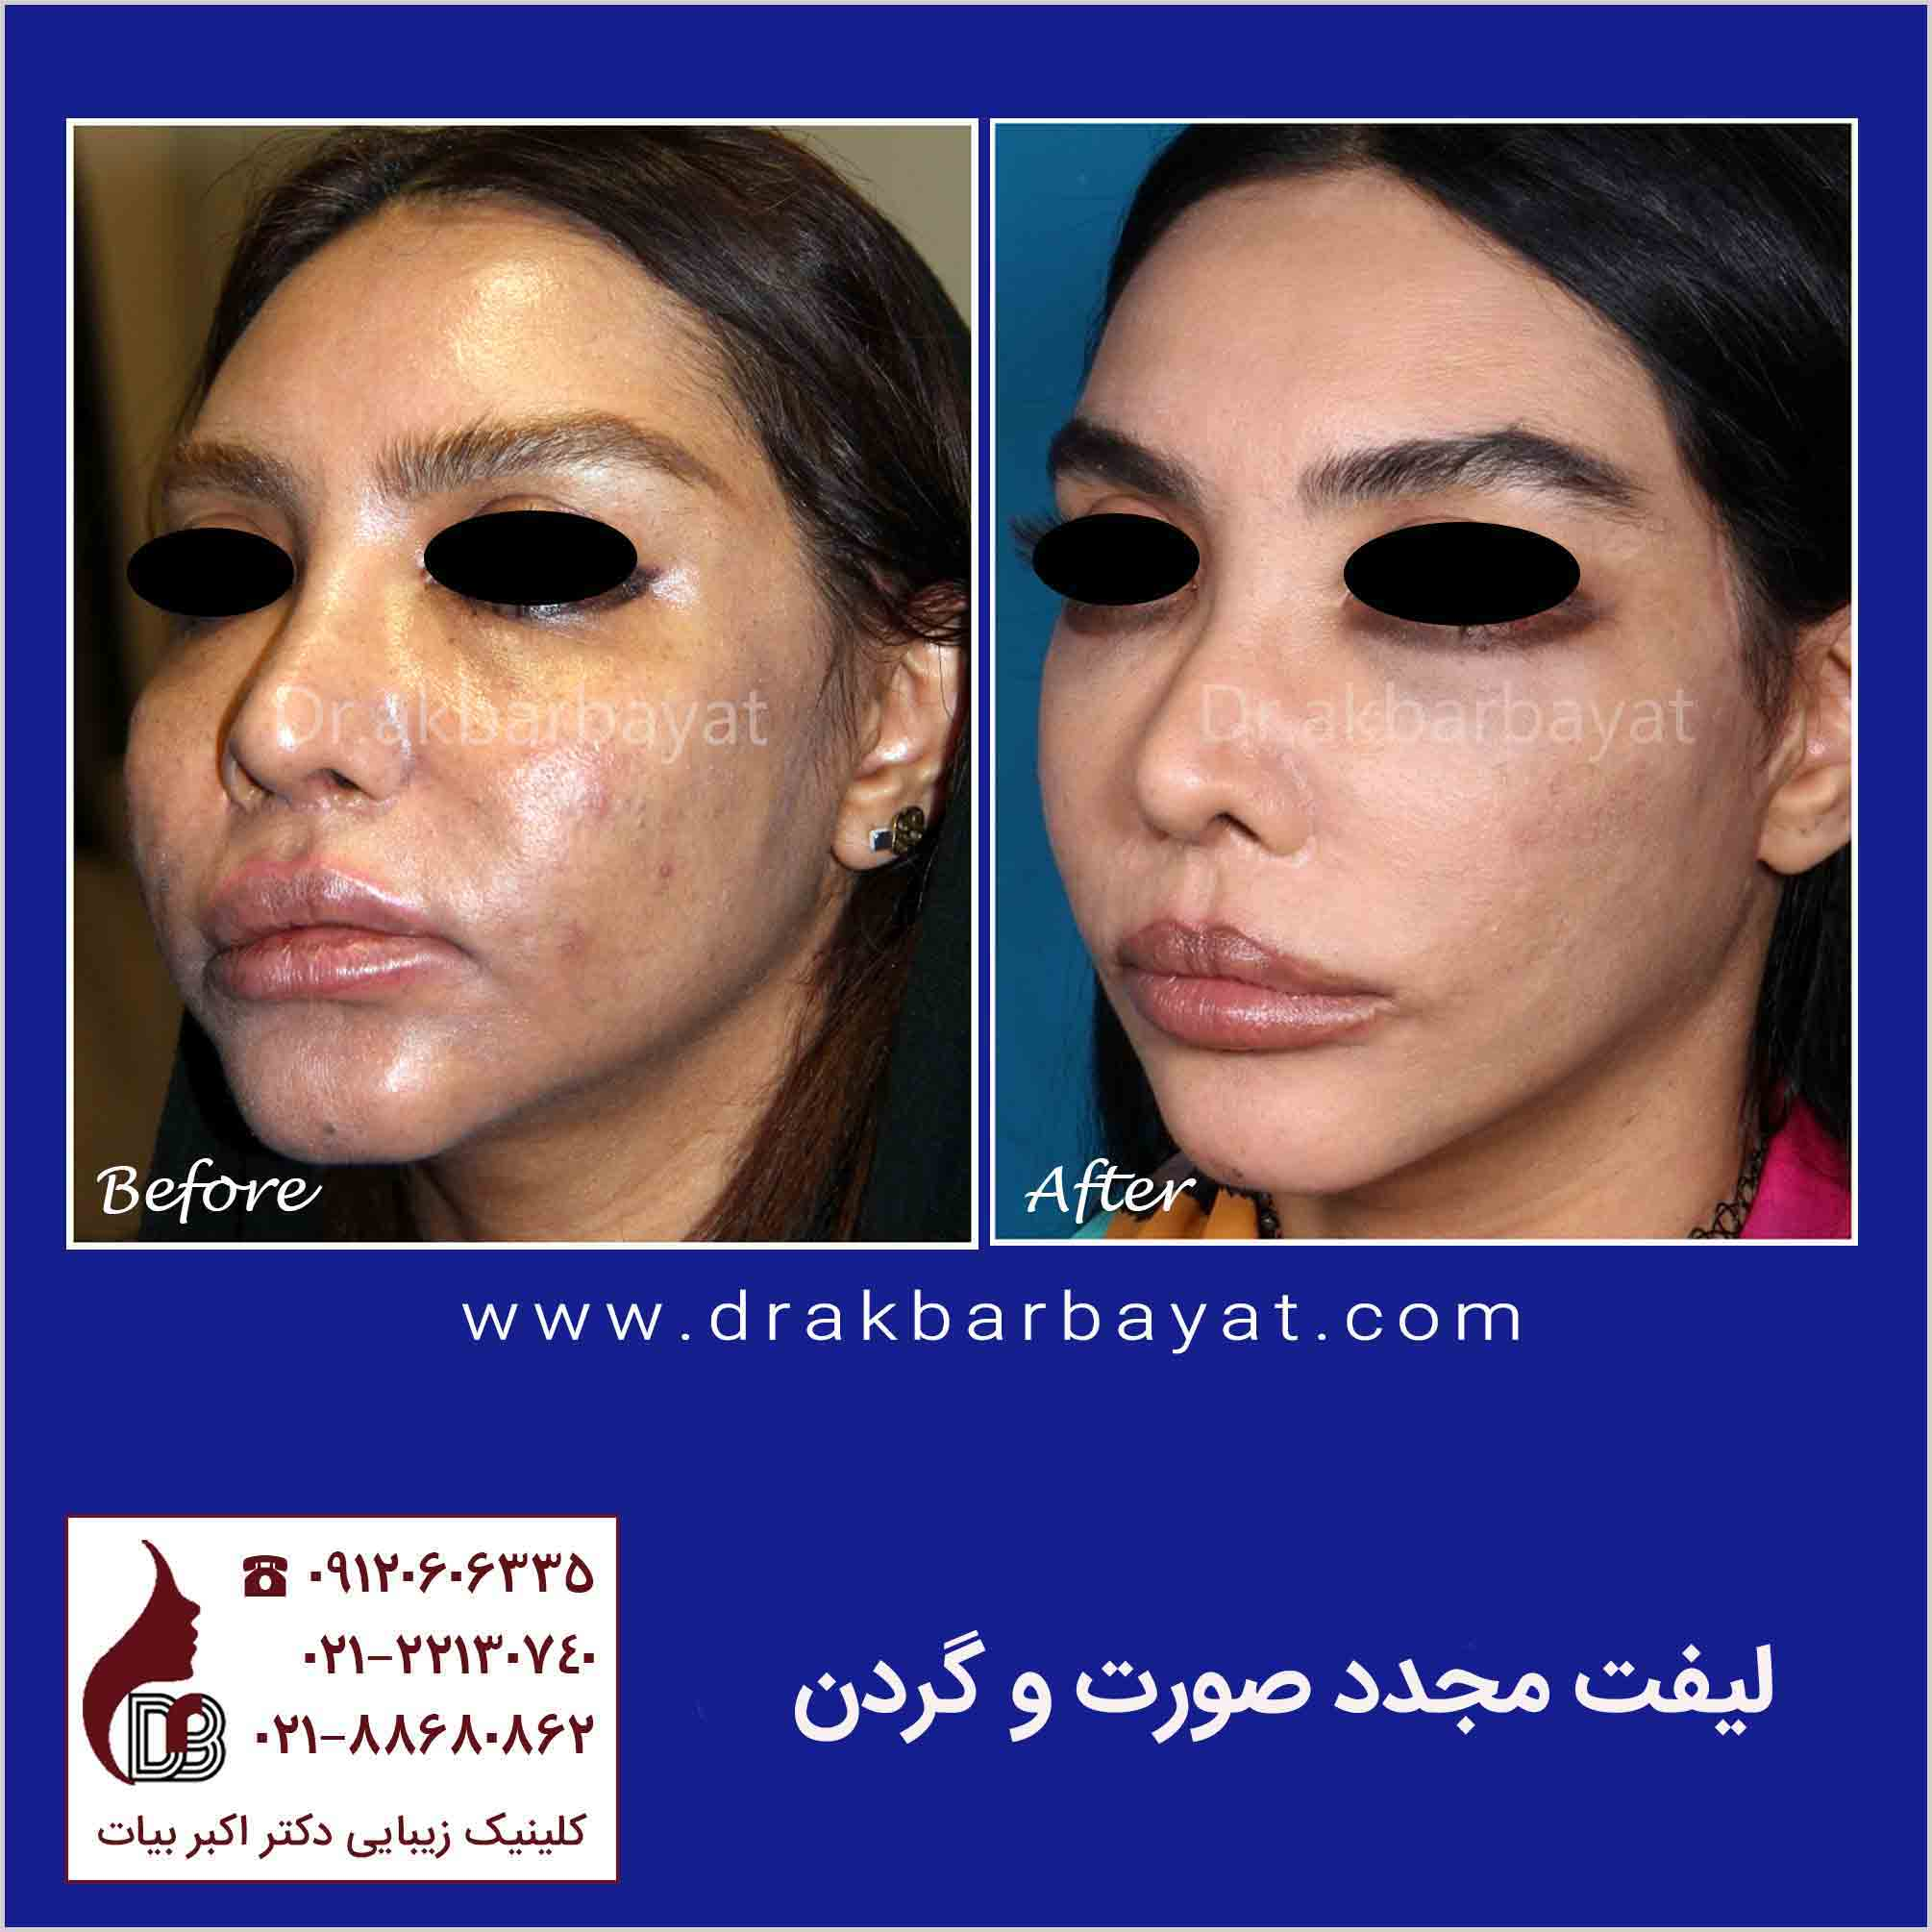 DrakbarBayat-Face Lift | جراحی ترمیمی لیفت صورت | بهترین جراح پلاستیک صورت